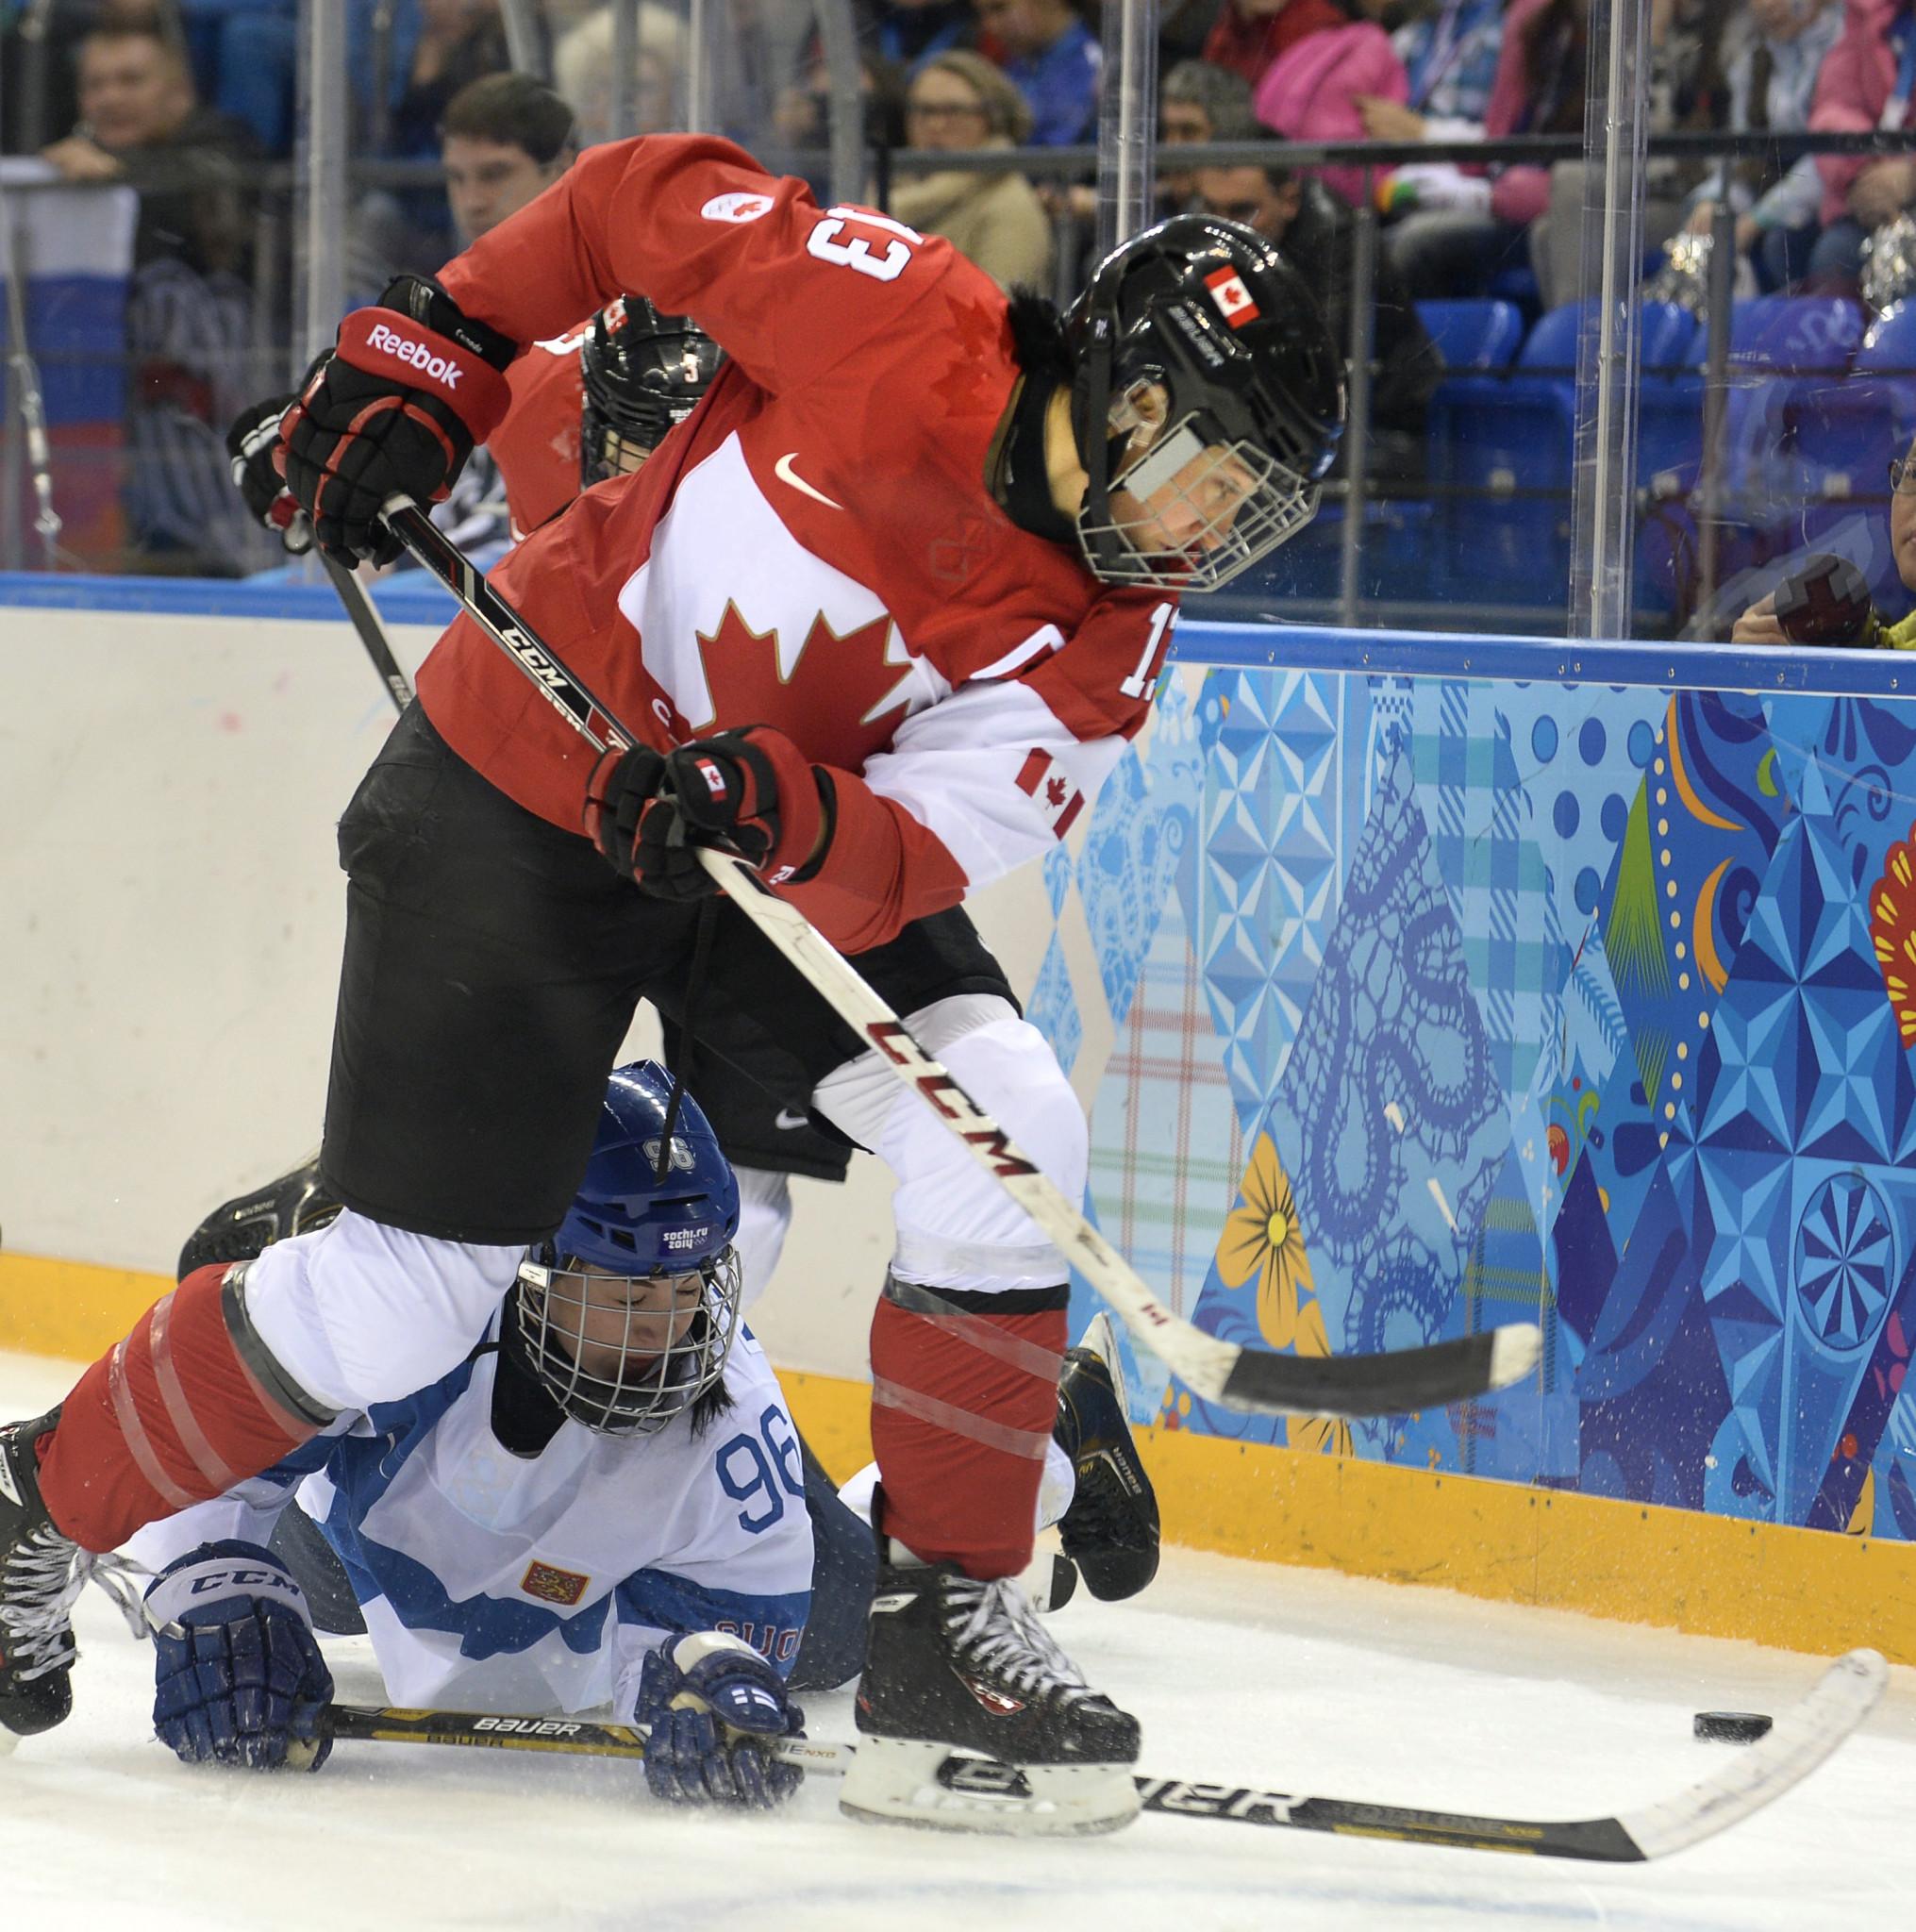 Quadruple Olympic gold medallist Ouellette announces ice hockey retirement